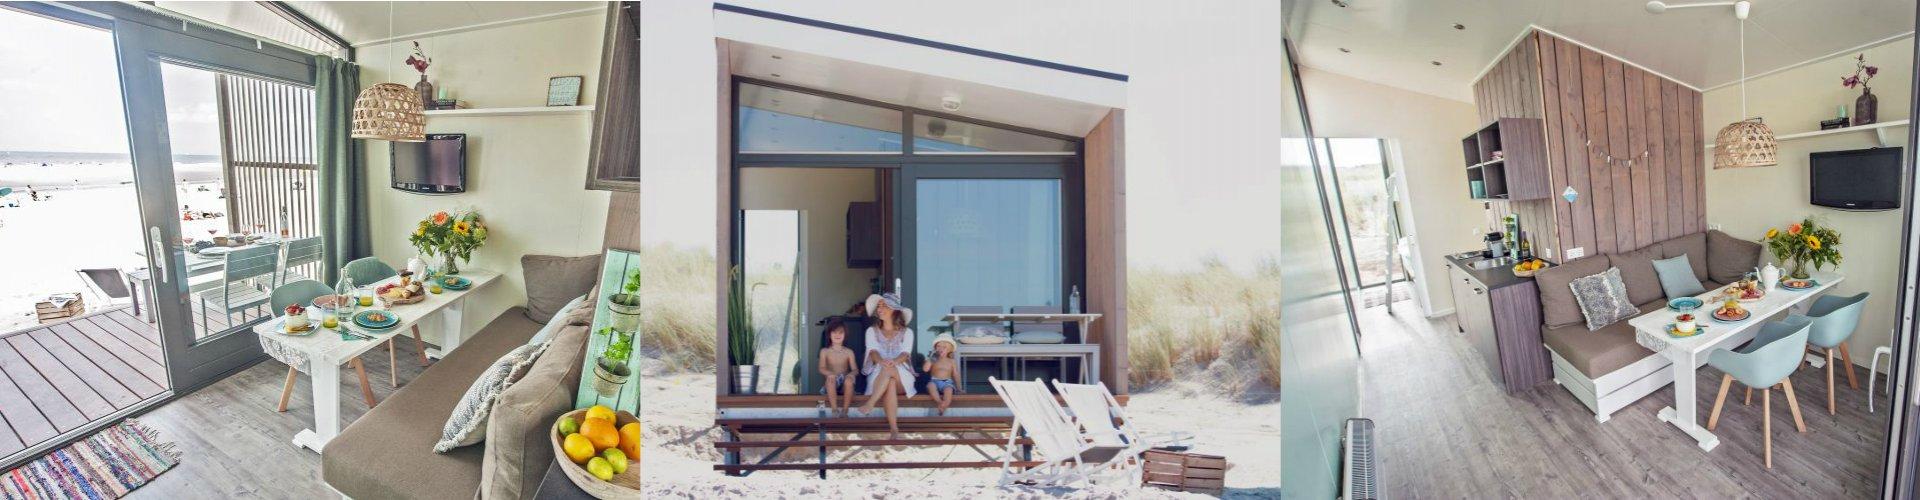 Roompot Kijkduin Strandhuisjes